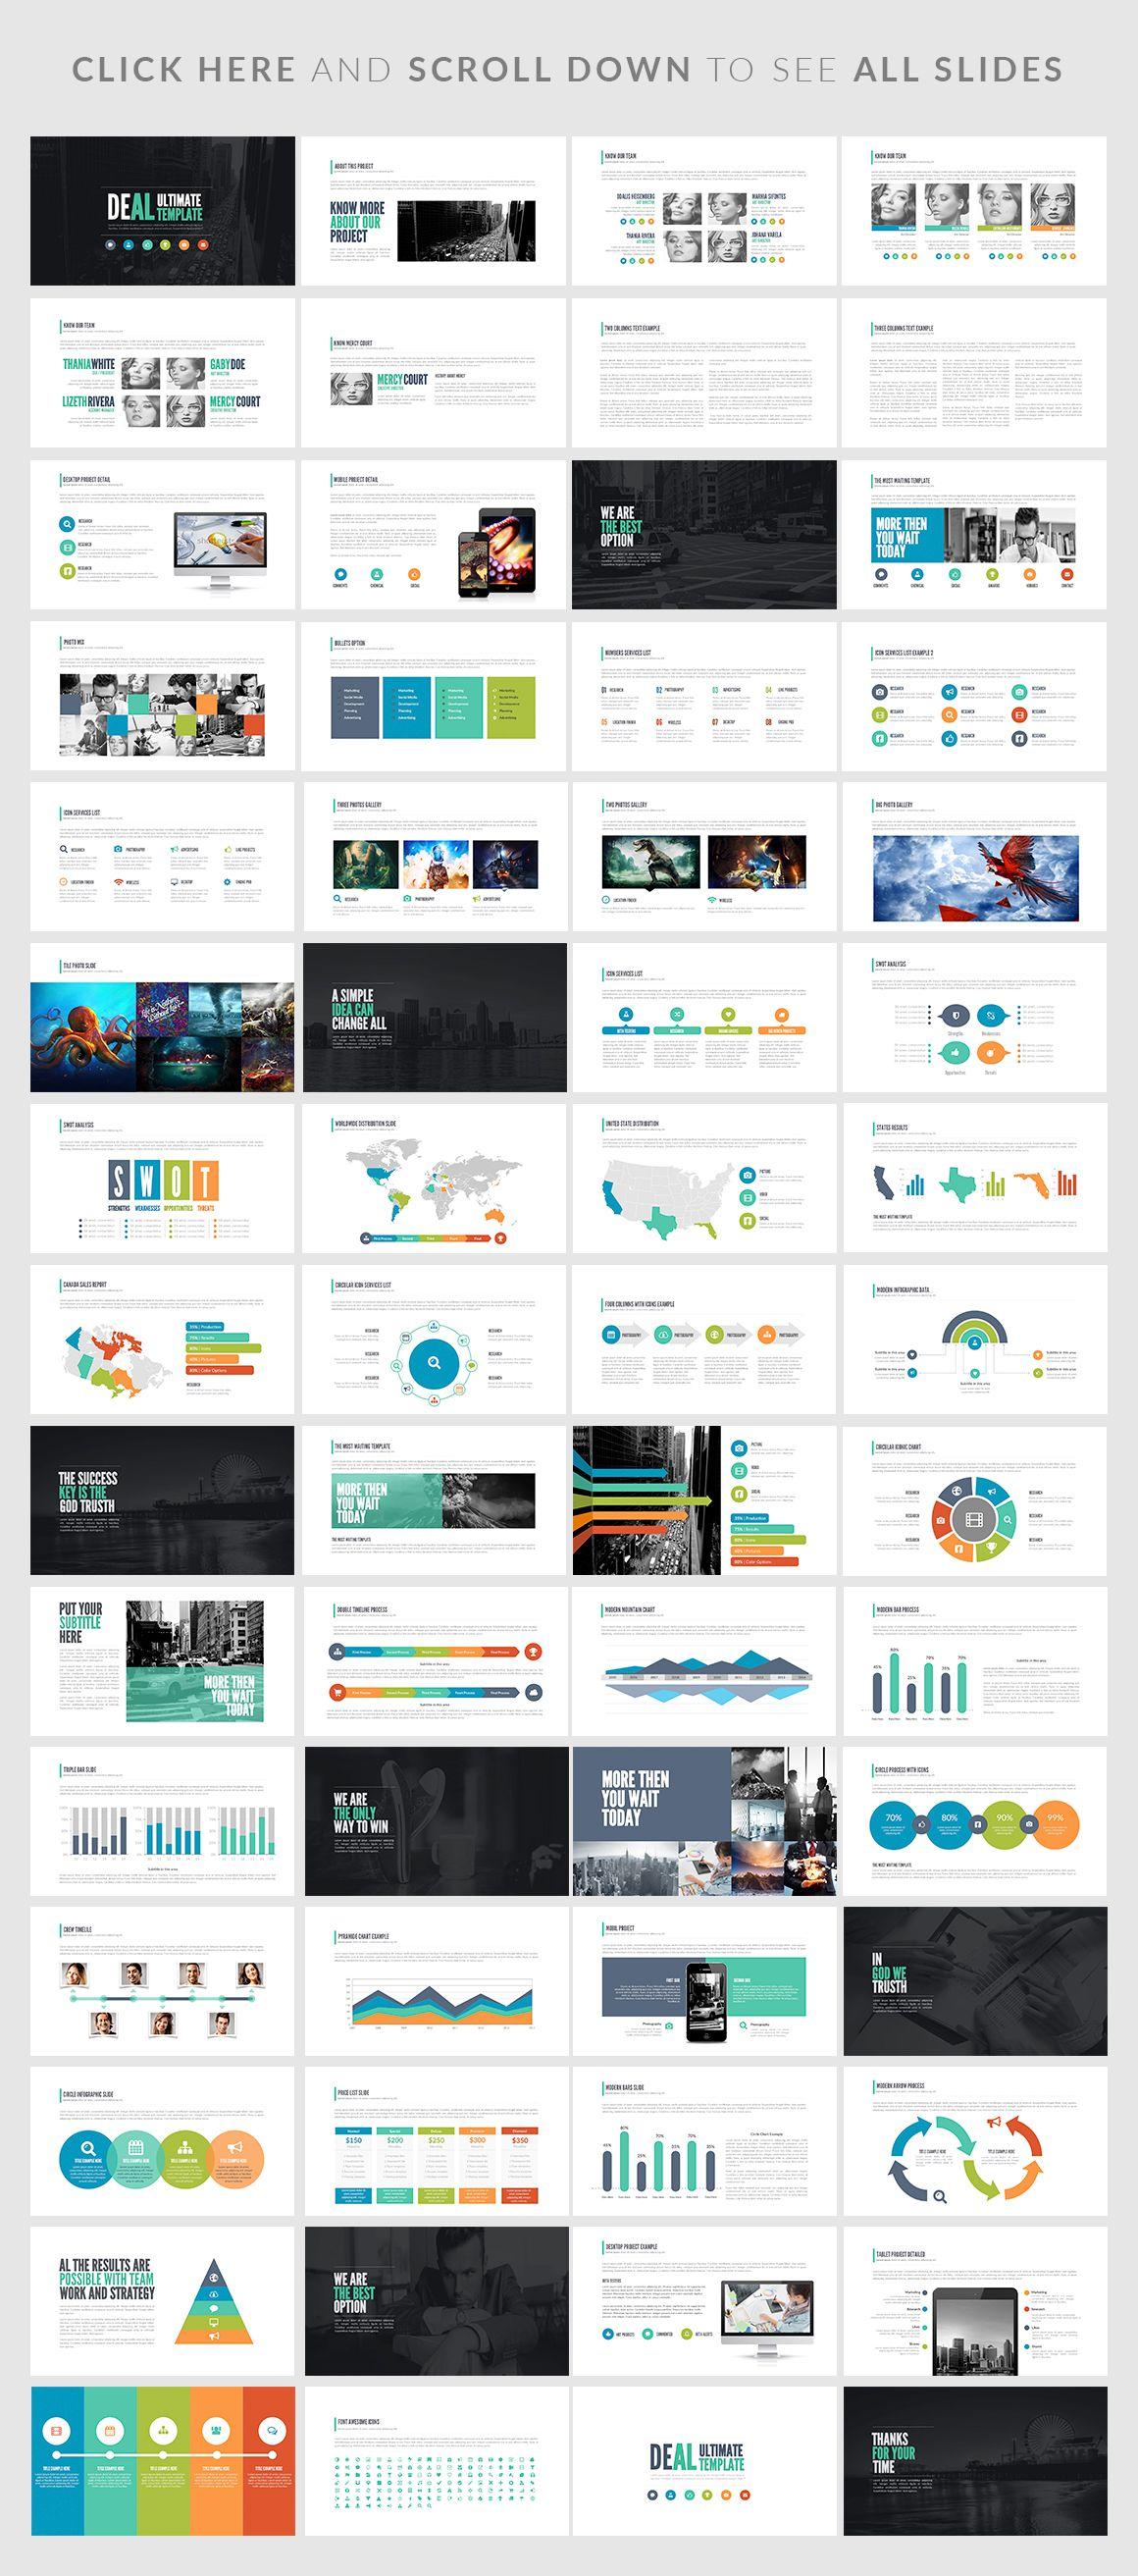 Deal | Powerpoint Presentation by Zacomic Studios on Creative Market